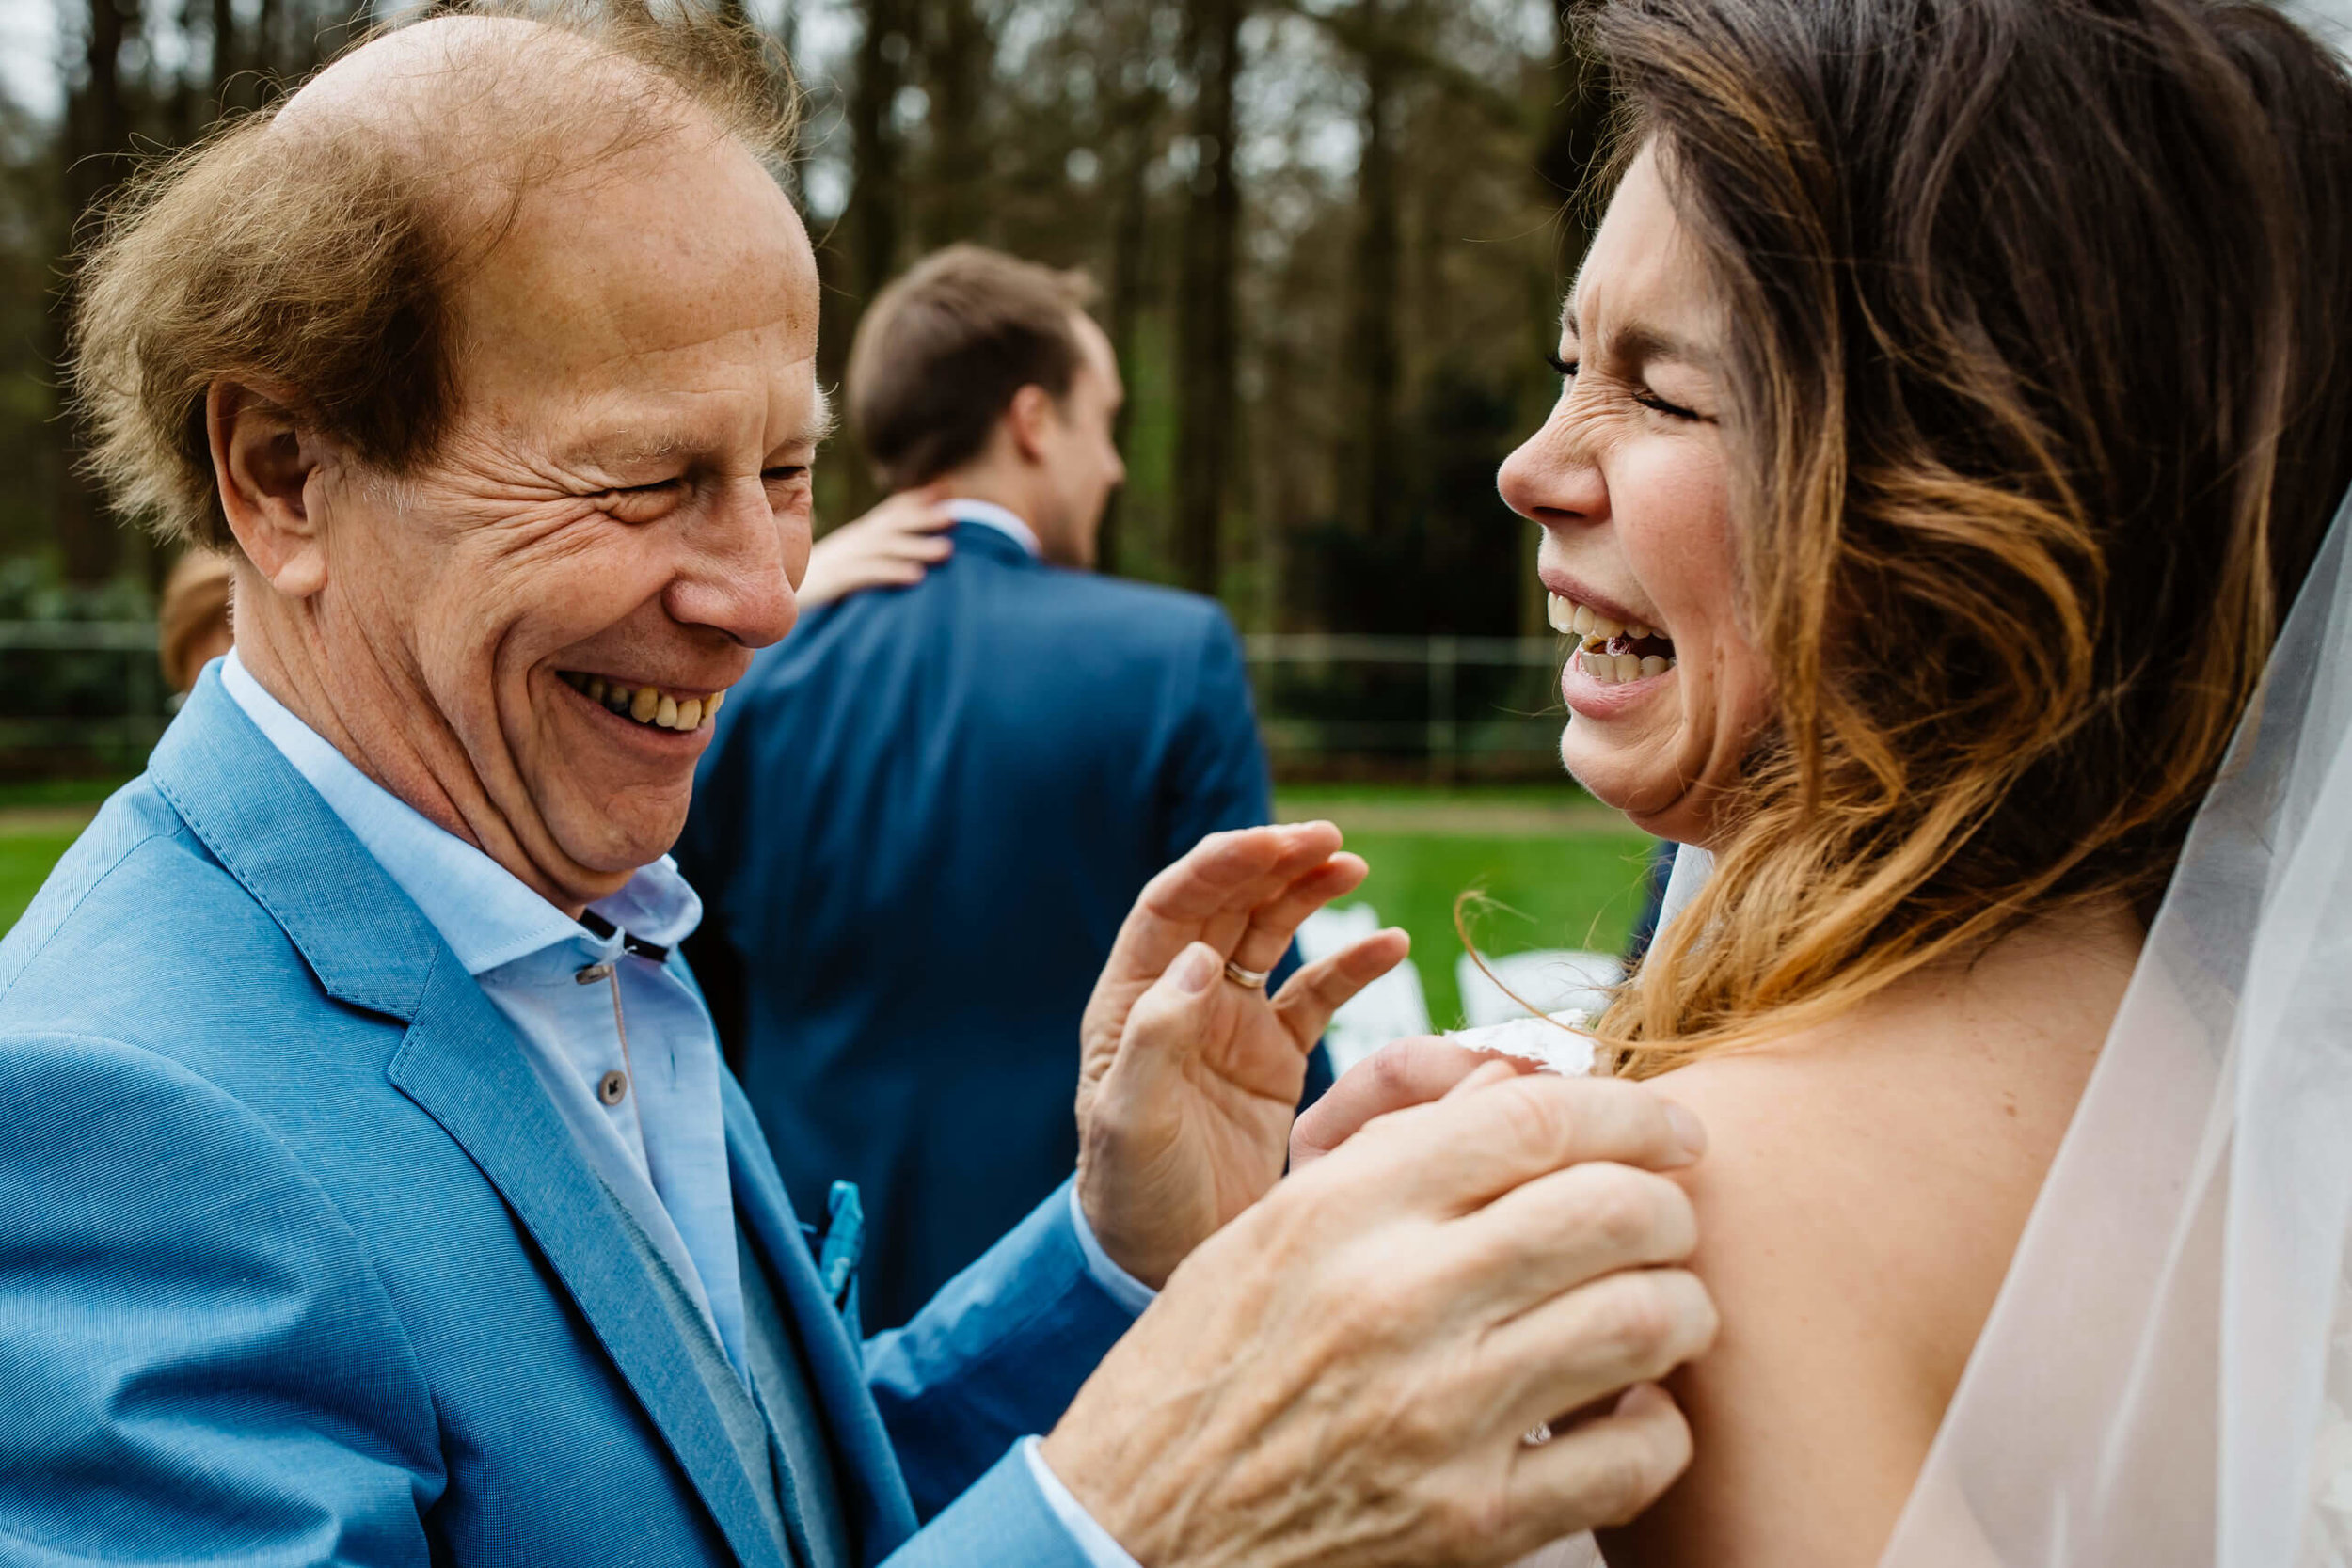 bruidsfotograaf-landgoed-groot-warnsborn-20.jpg